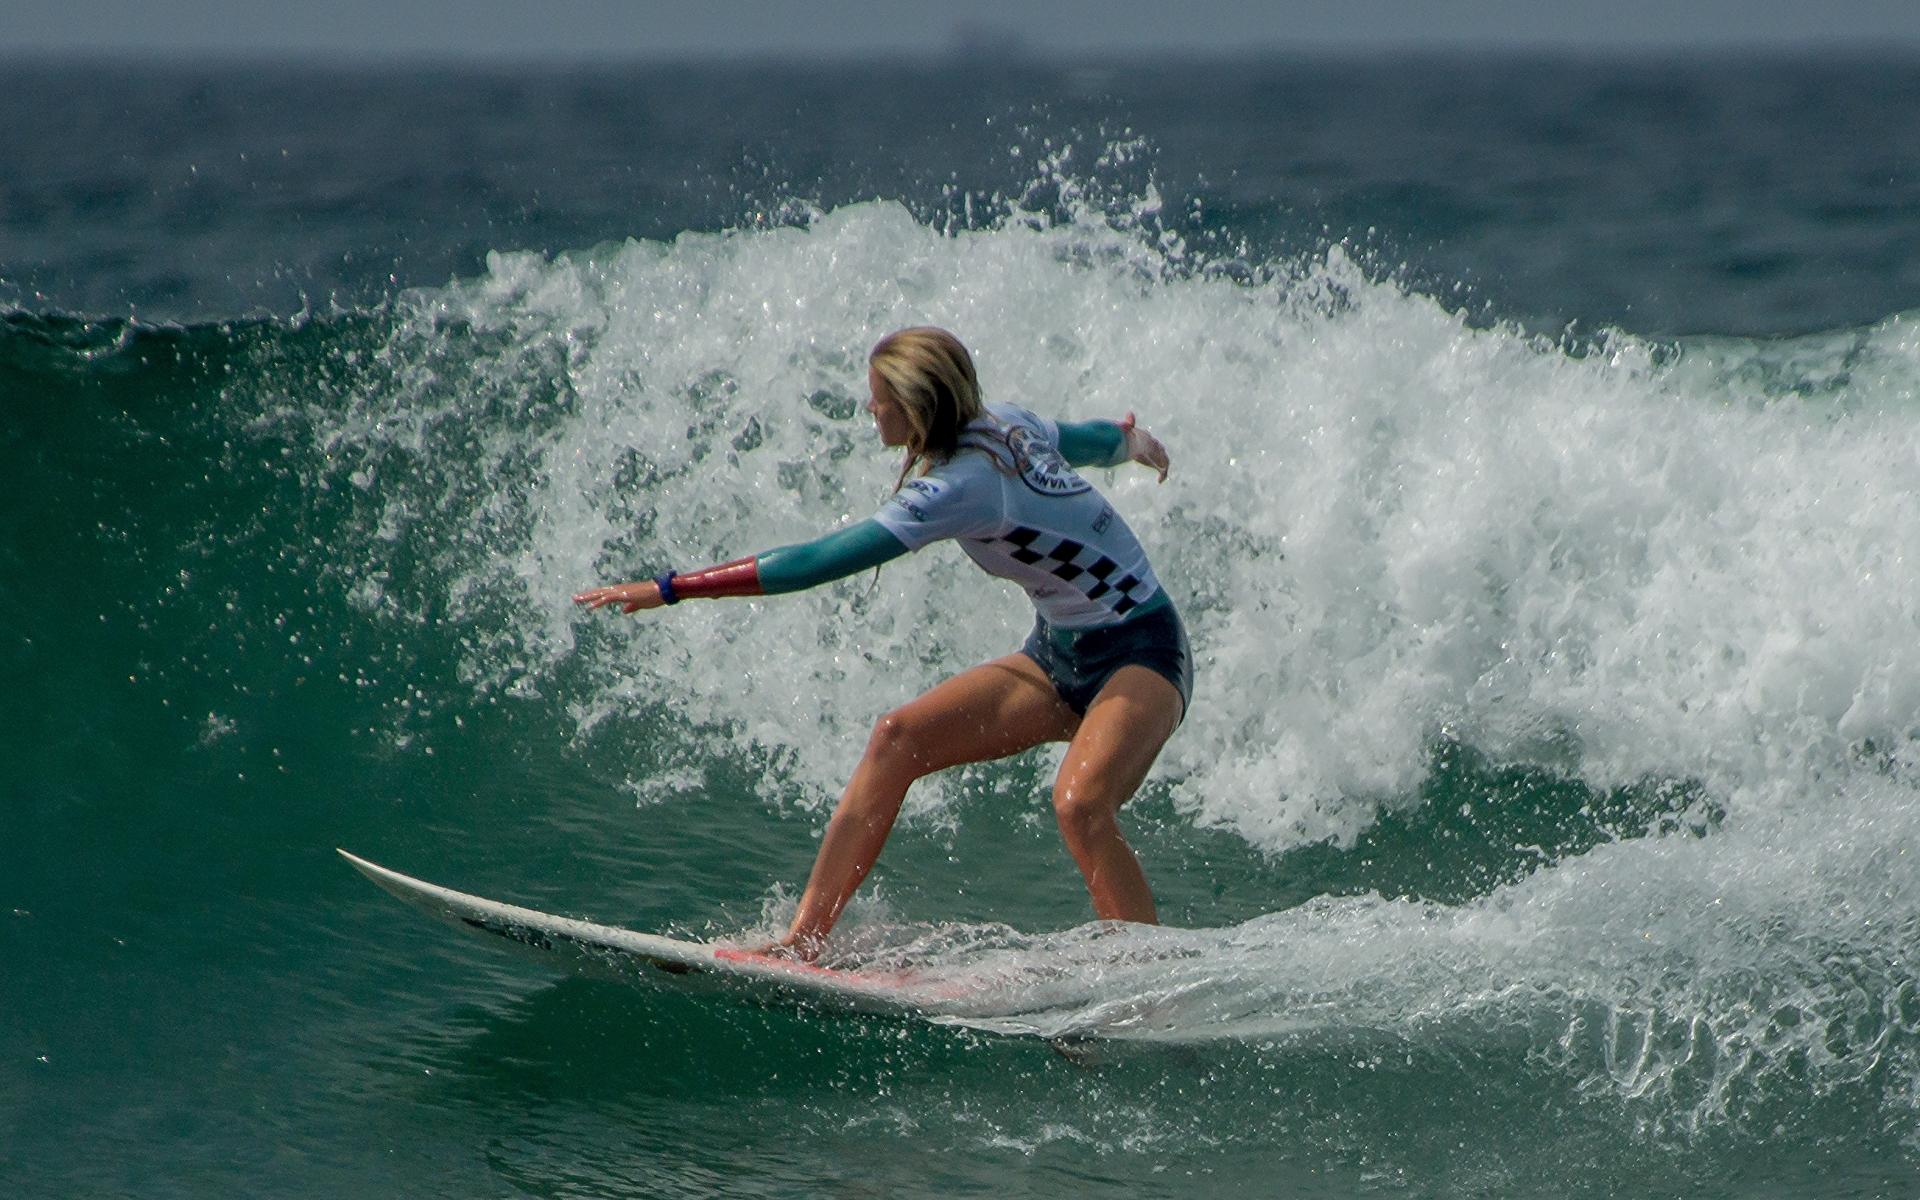 Rubias practicando Surf - 1920x1200